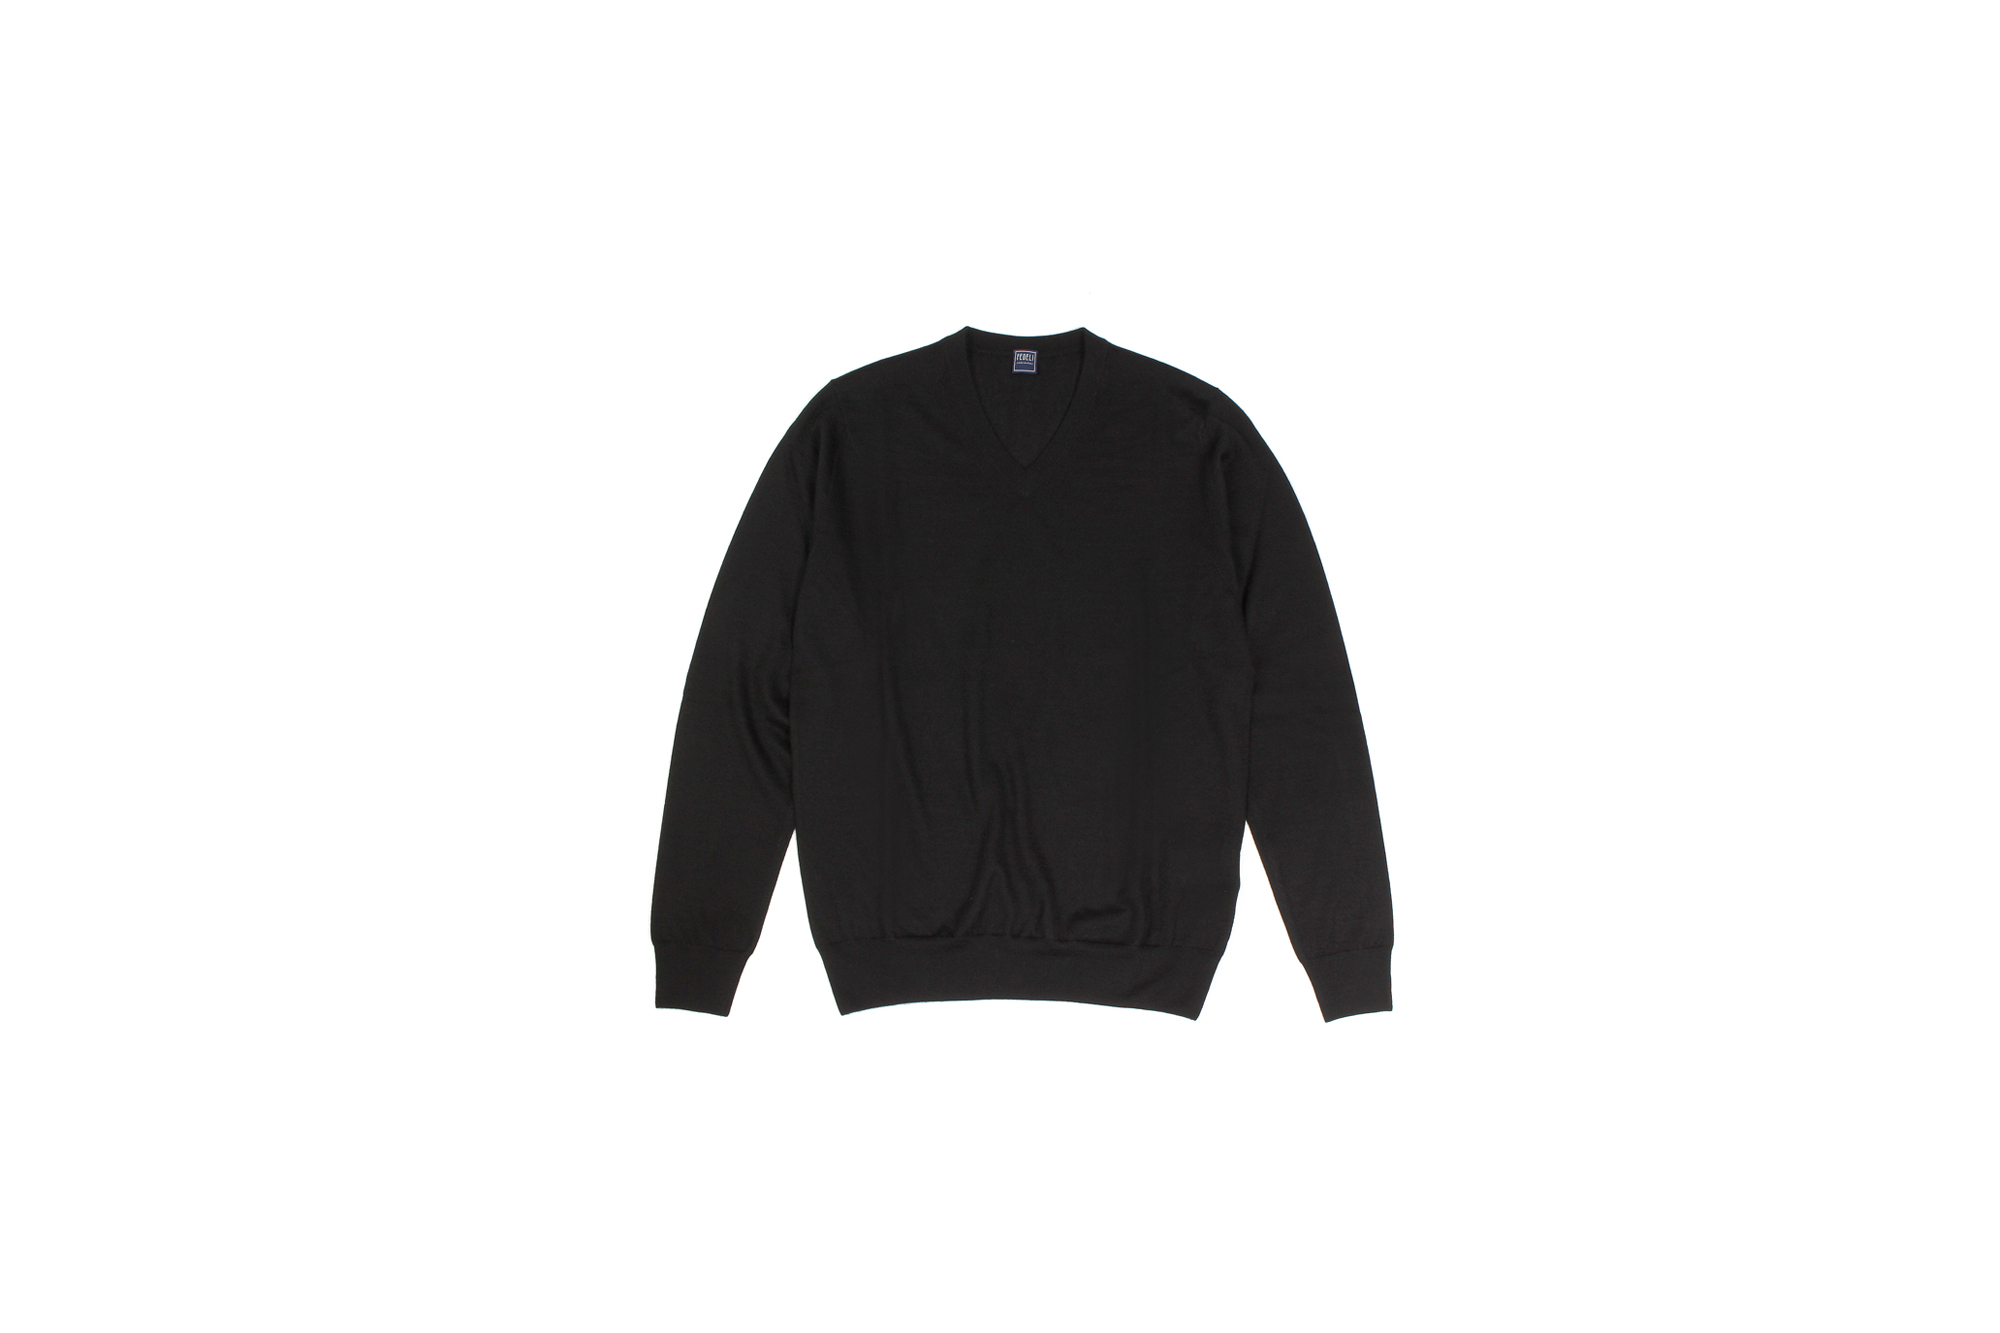 FEDELI (フェデリ) Silk Cashmere V Neck Sweater シルクカシミア Vネック セーター BLACK (ブラック・9) made in italy (イタリア製) 2021 秋冬新作 【入荷しました】【フリー分発売開始】Alto e Diritto altoediritto アルトエデリット 愛知 名古屋 シルカシ Vネックニット